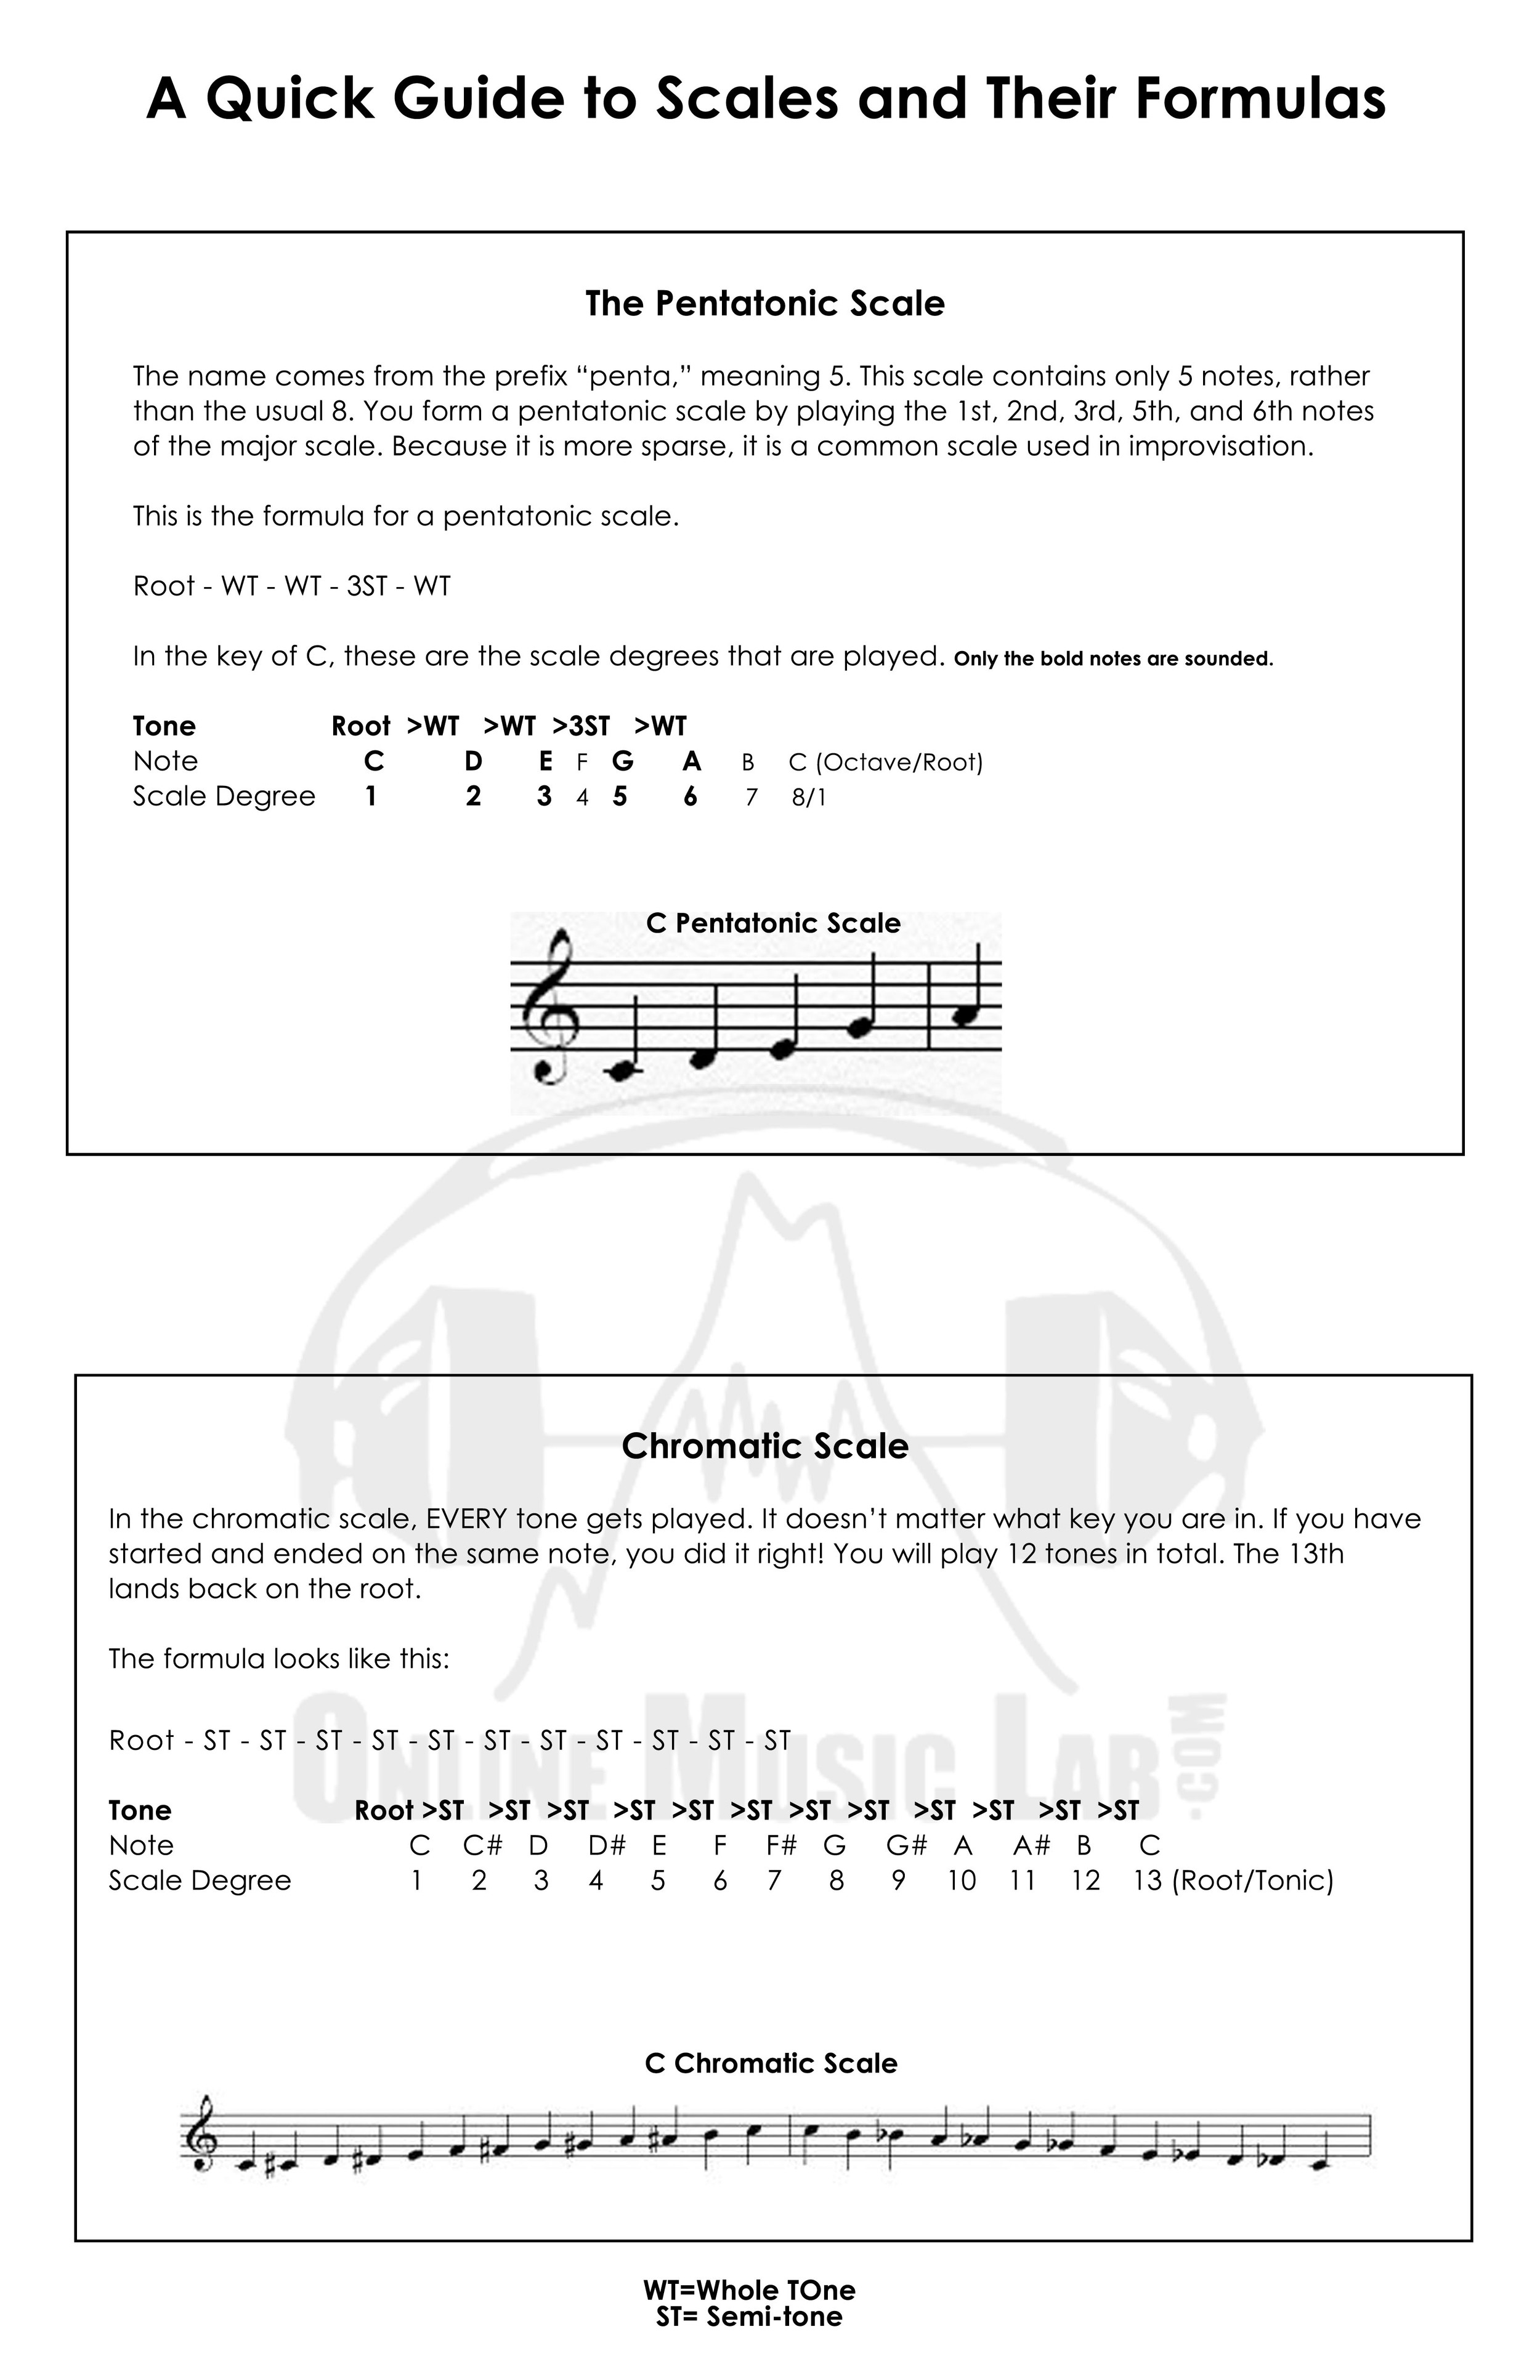 OML_scale cheat sheet3.jpg